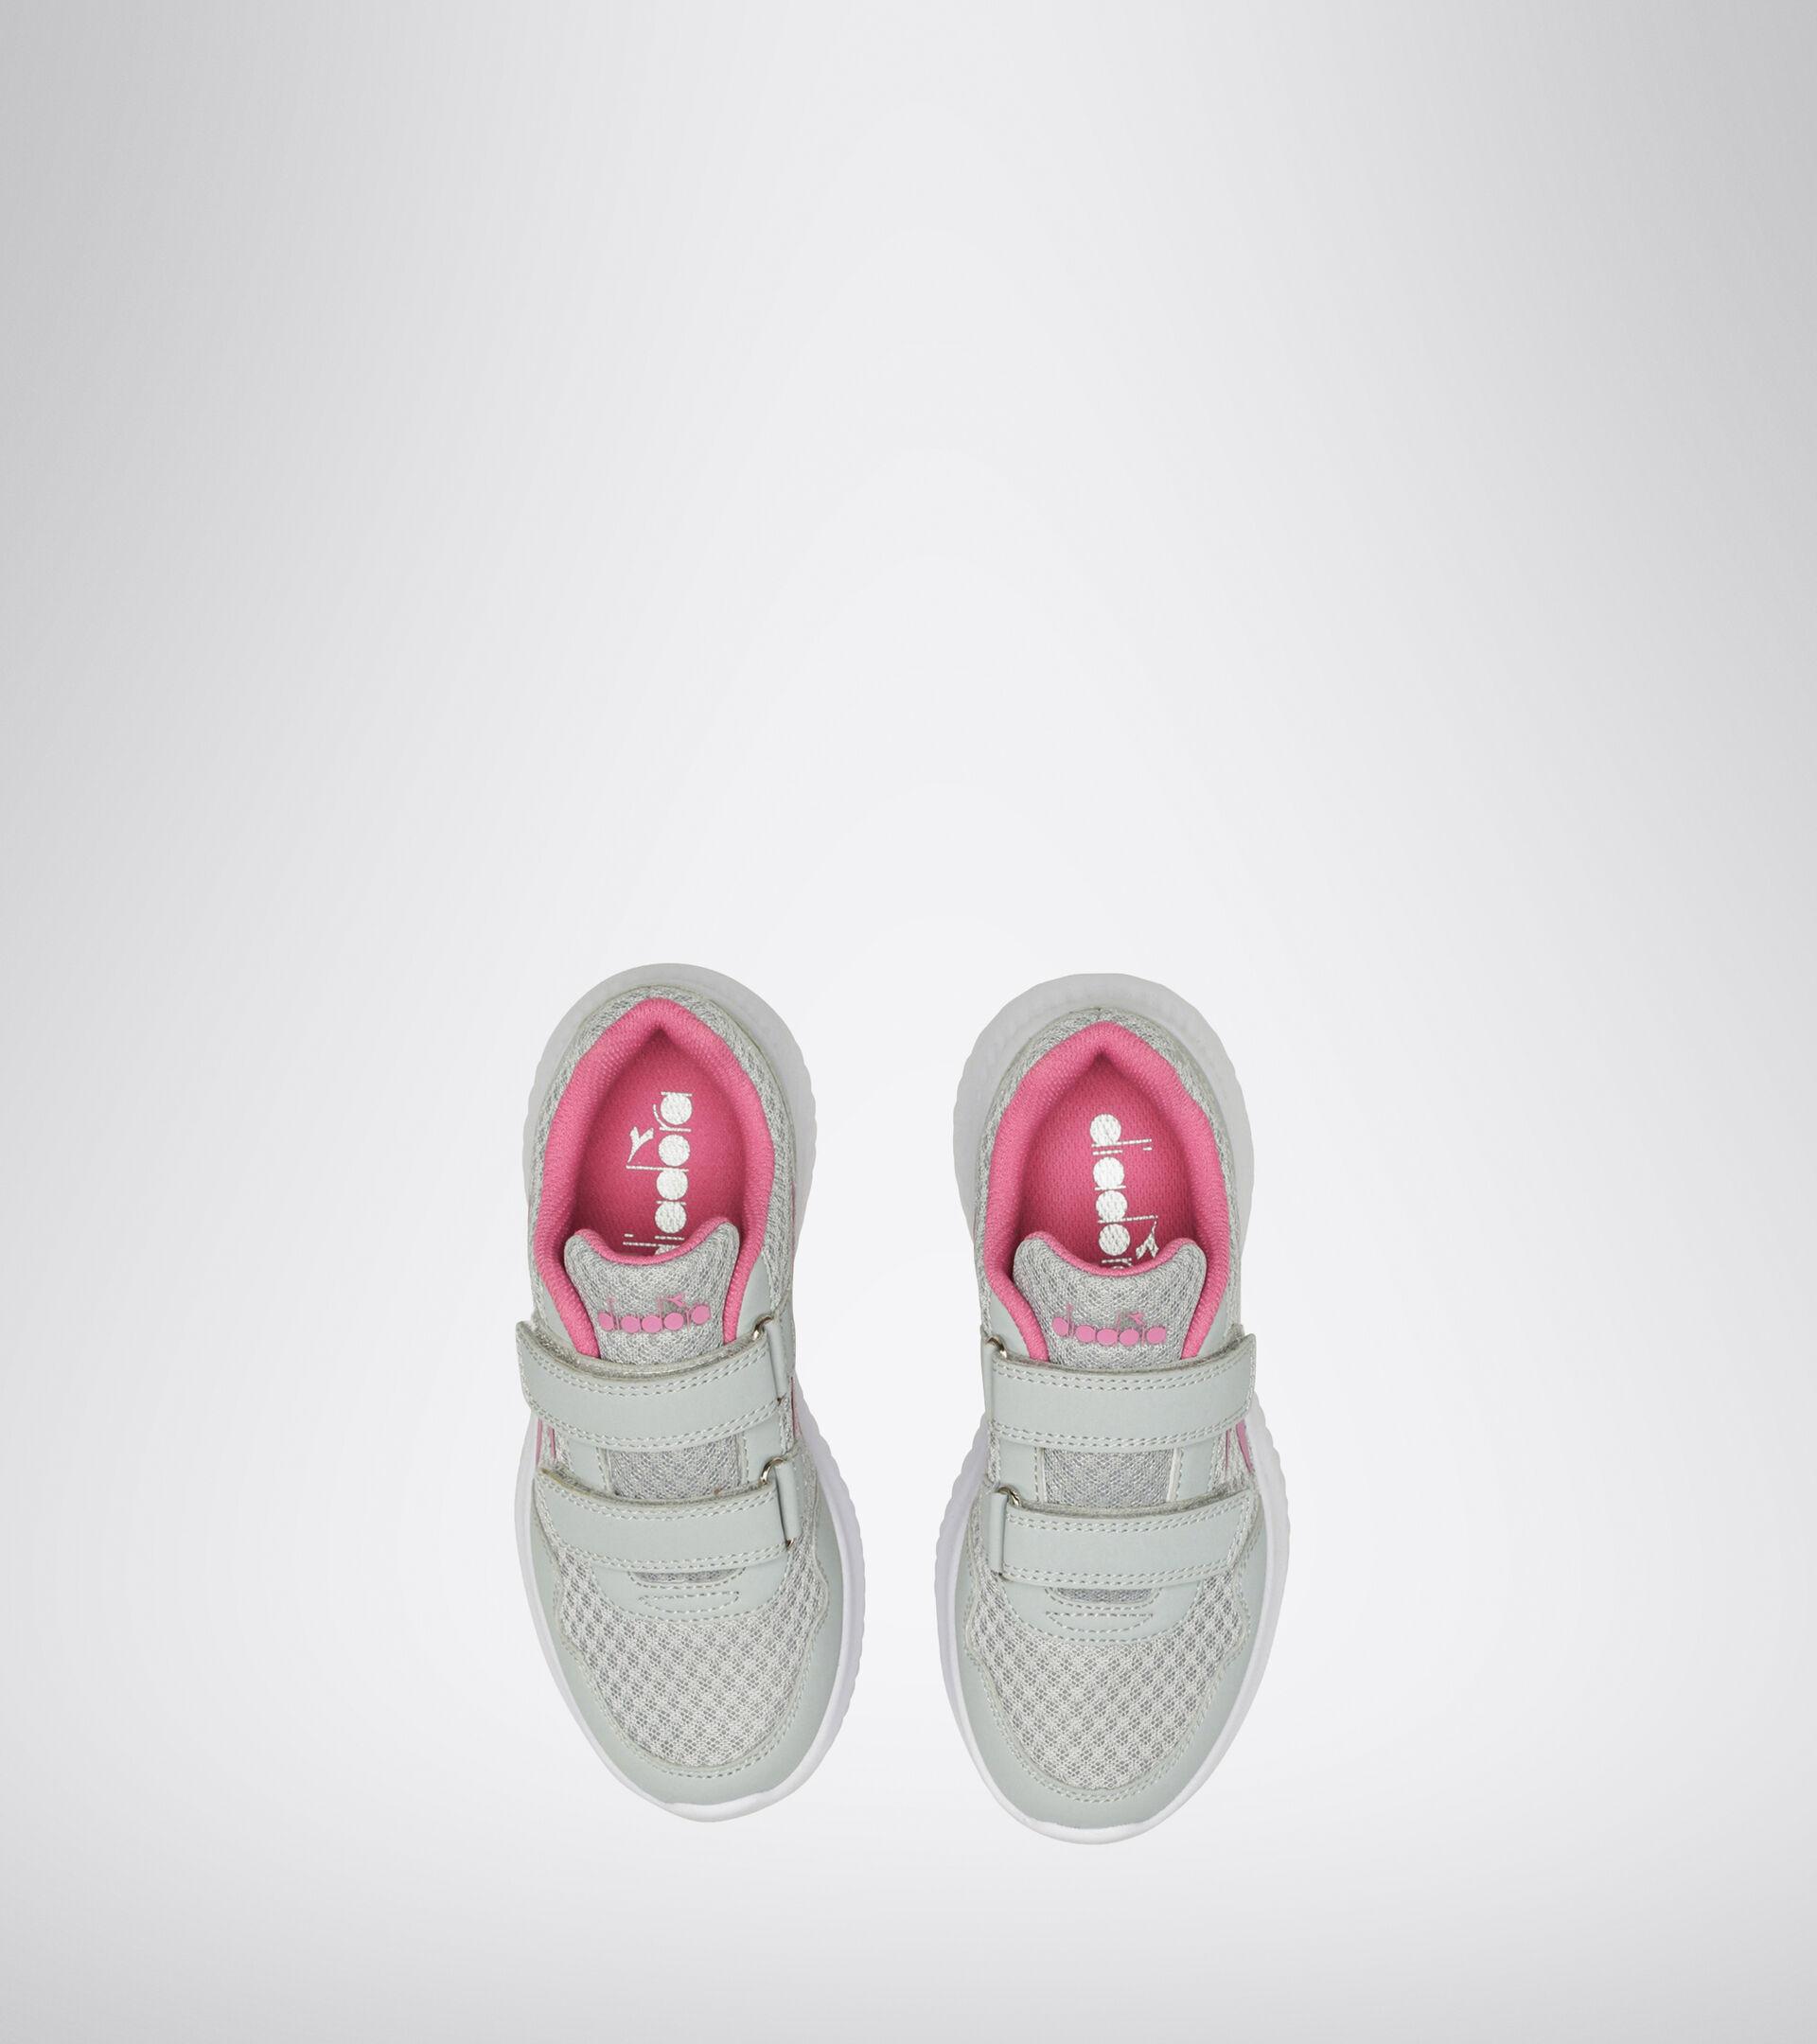 Footwear Sport BAMBINO ROBIN 2 JR V SILVER/WILD ORCHID Diadora